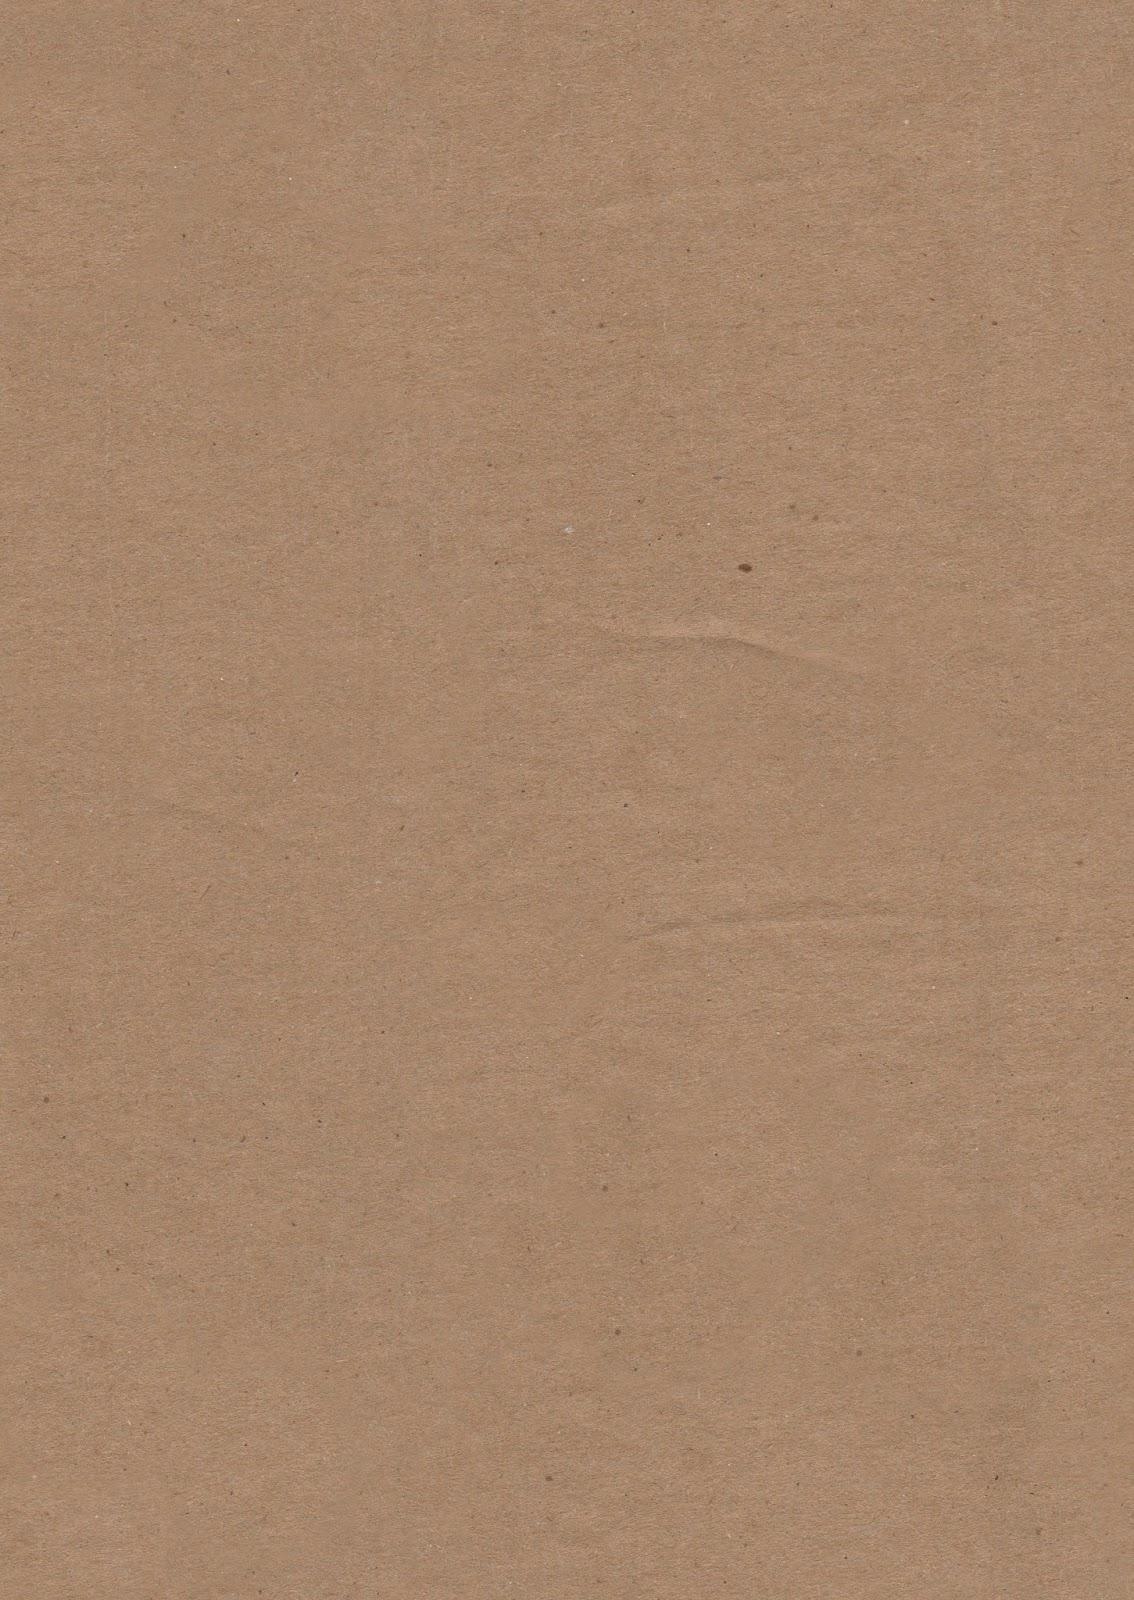 Seamless Cardboard Texture Texturise Free Seamless